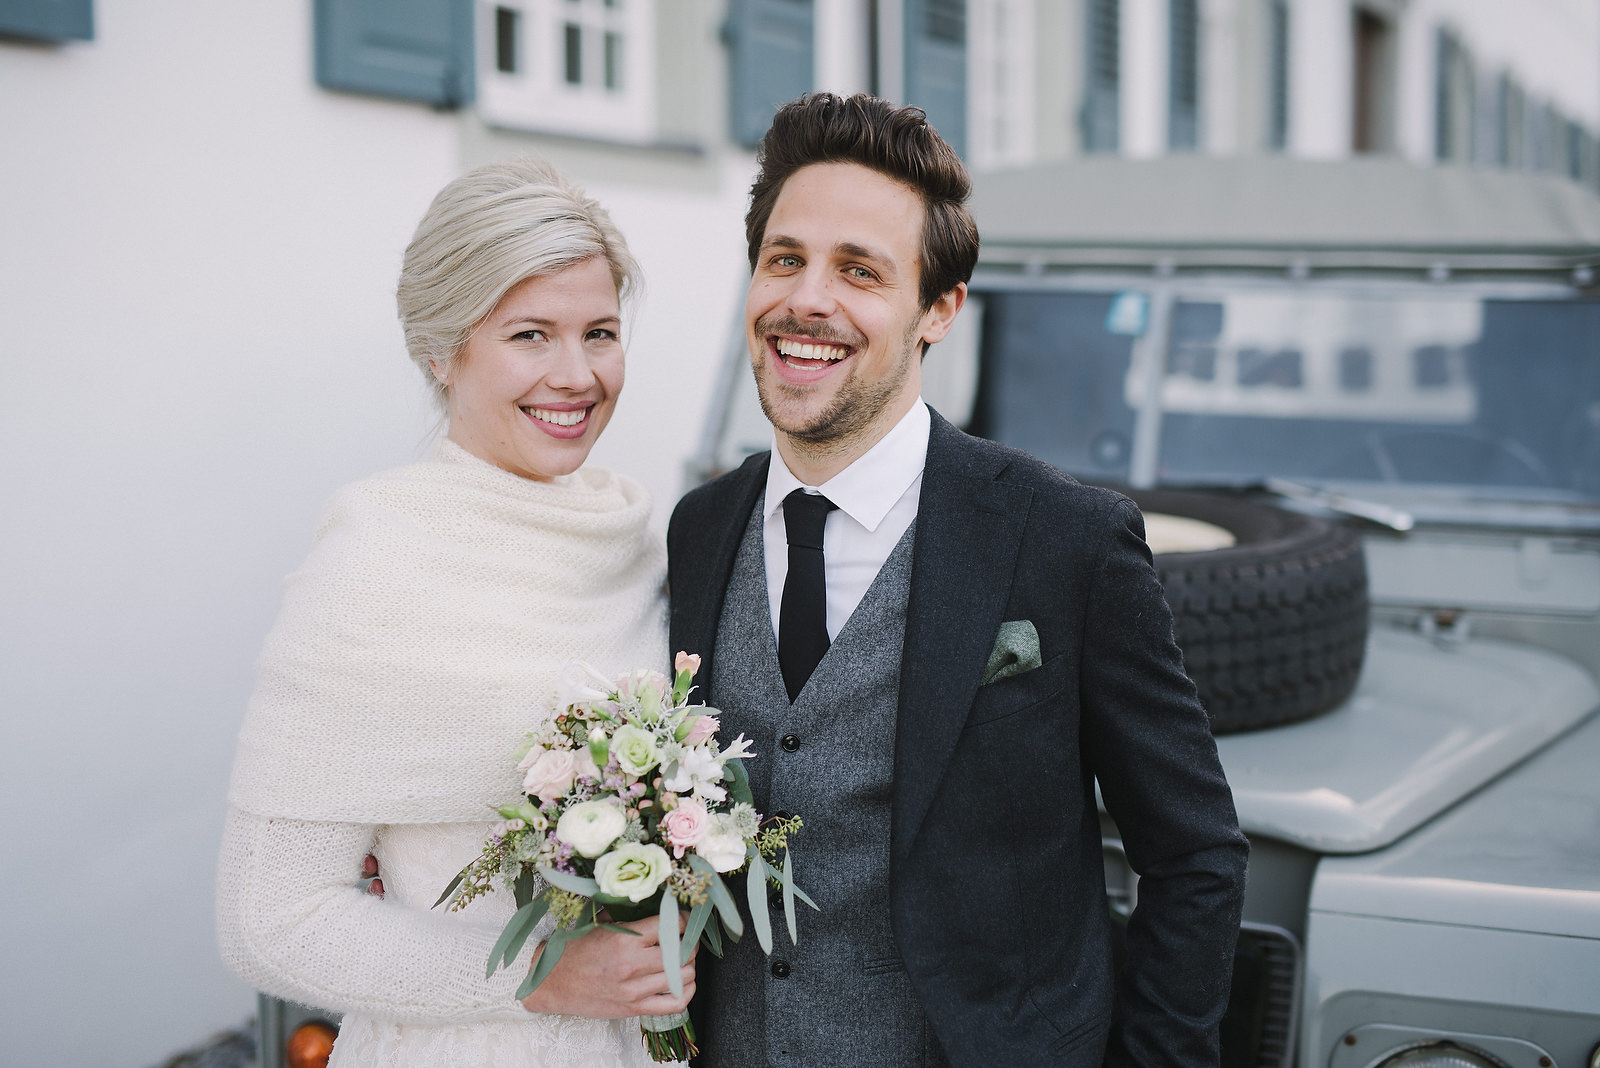 Fotograf Konstanz - Silvester Wedding in Hagnau / Friedrichshafen at Lake of Constance  - 23 -